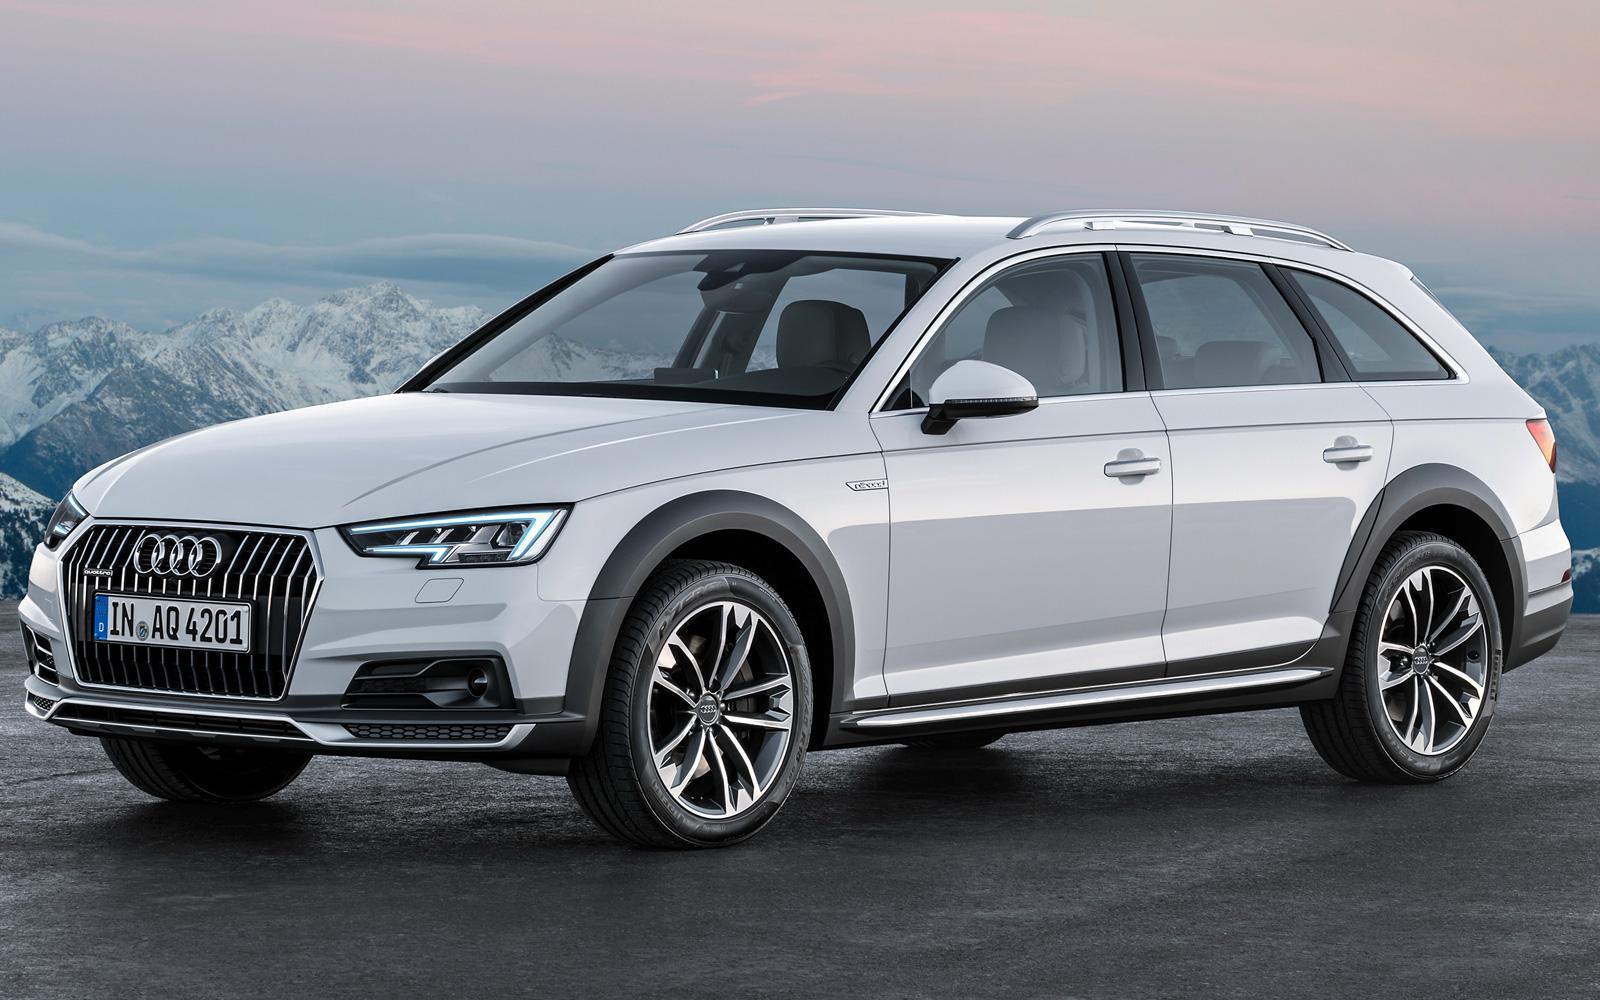 Audi A4 (B9) allroad Quattro (2016)